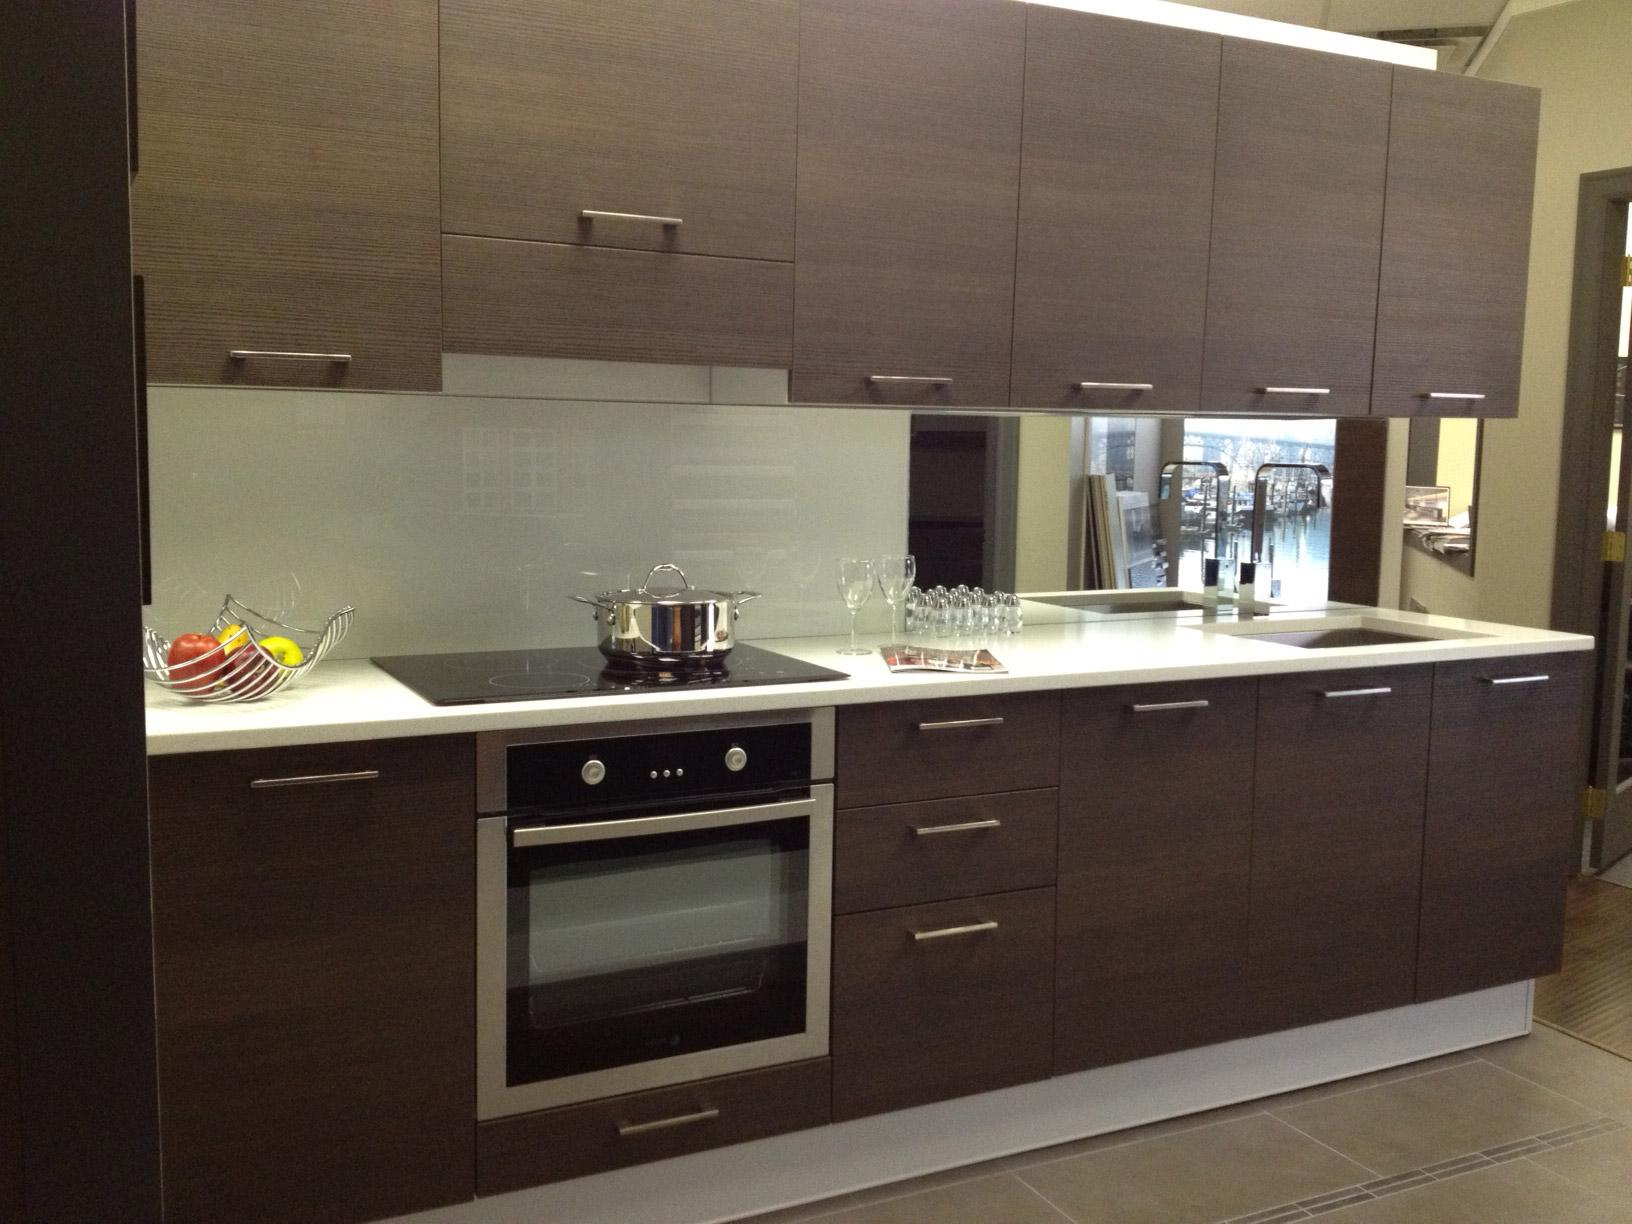 Cucina moderna Joy di Gicinque in mostra a Vancouver  Gicinque Cucine